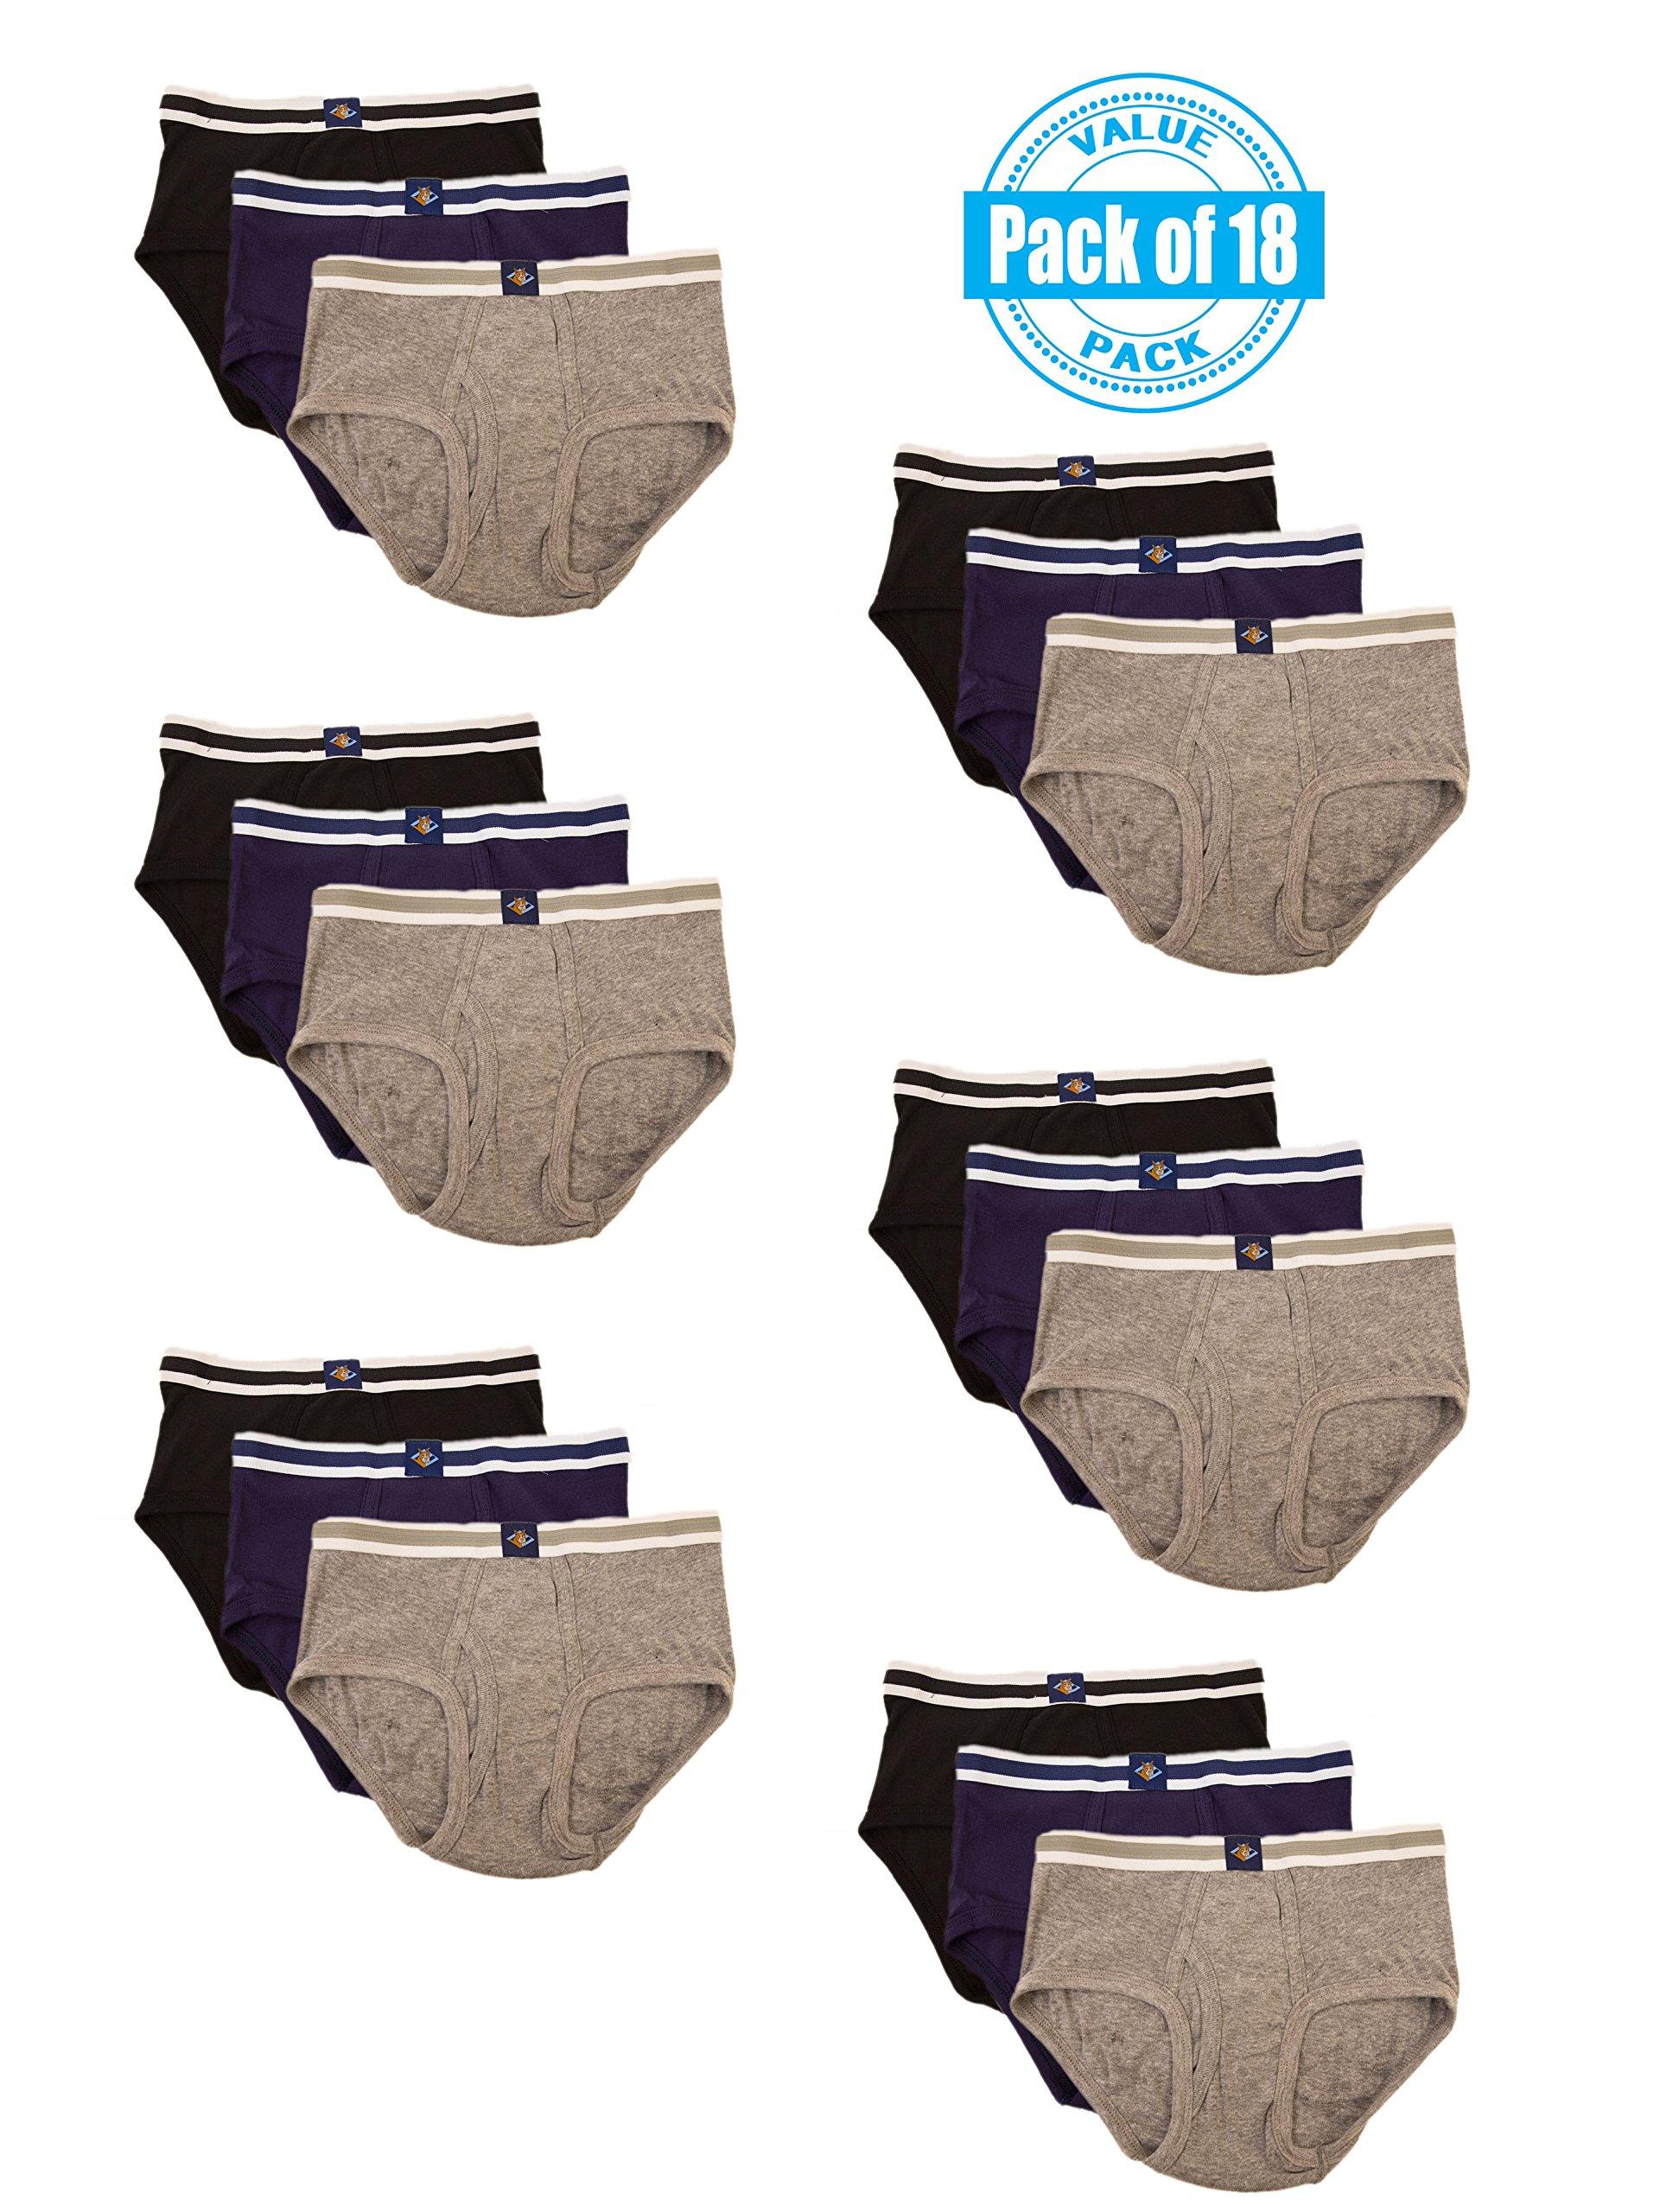 Joseph Abboud Boys 18 Pack Classics Full Cut Cotton Briefs (X-Large  18/20, Black /Grey/ Navy) by Joseph Abboud (Image #1)